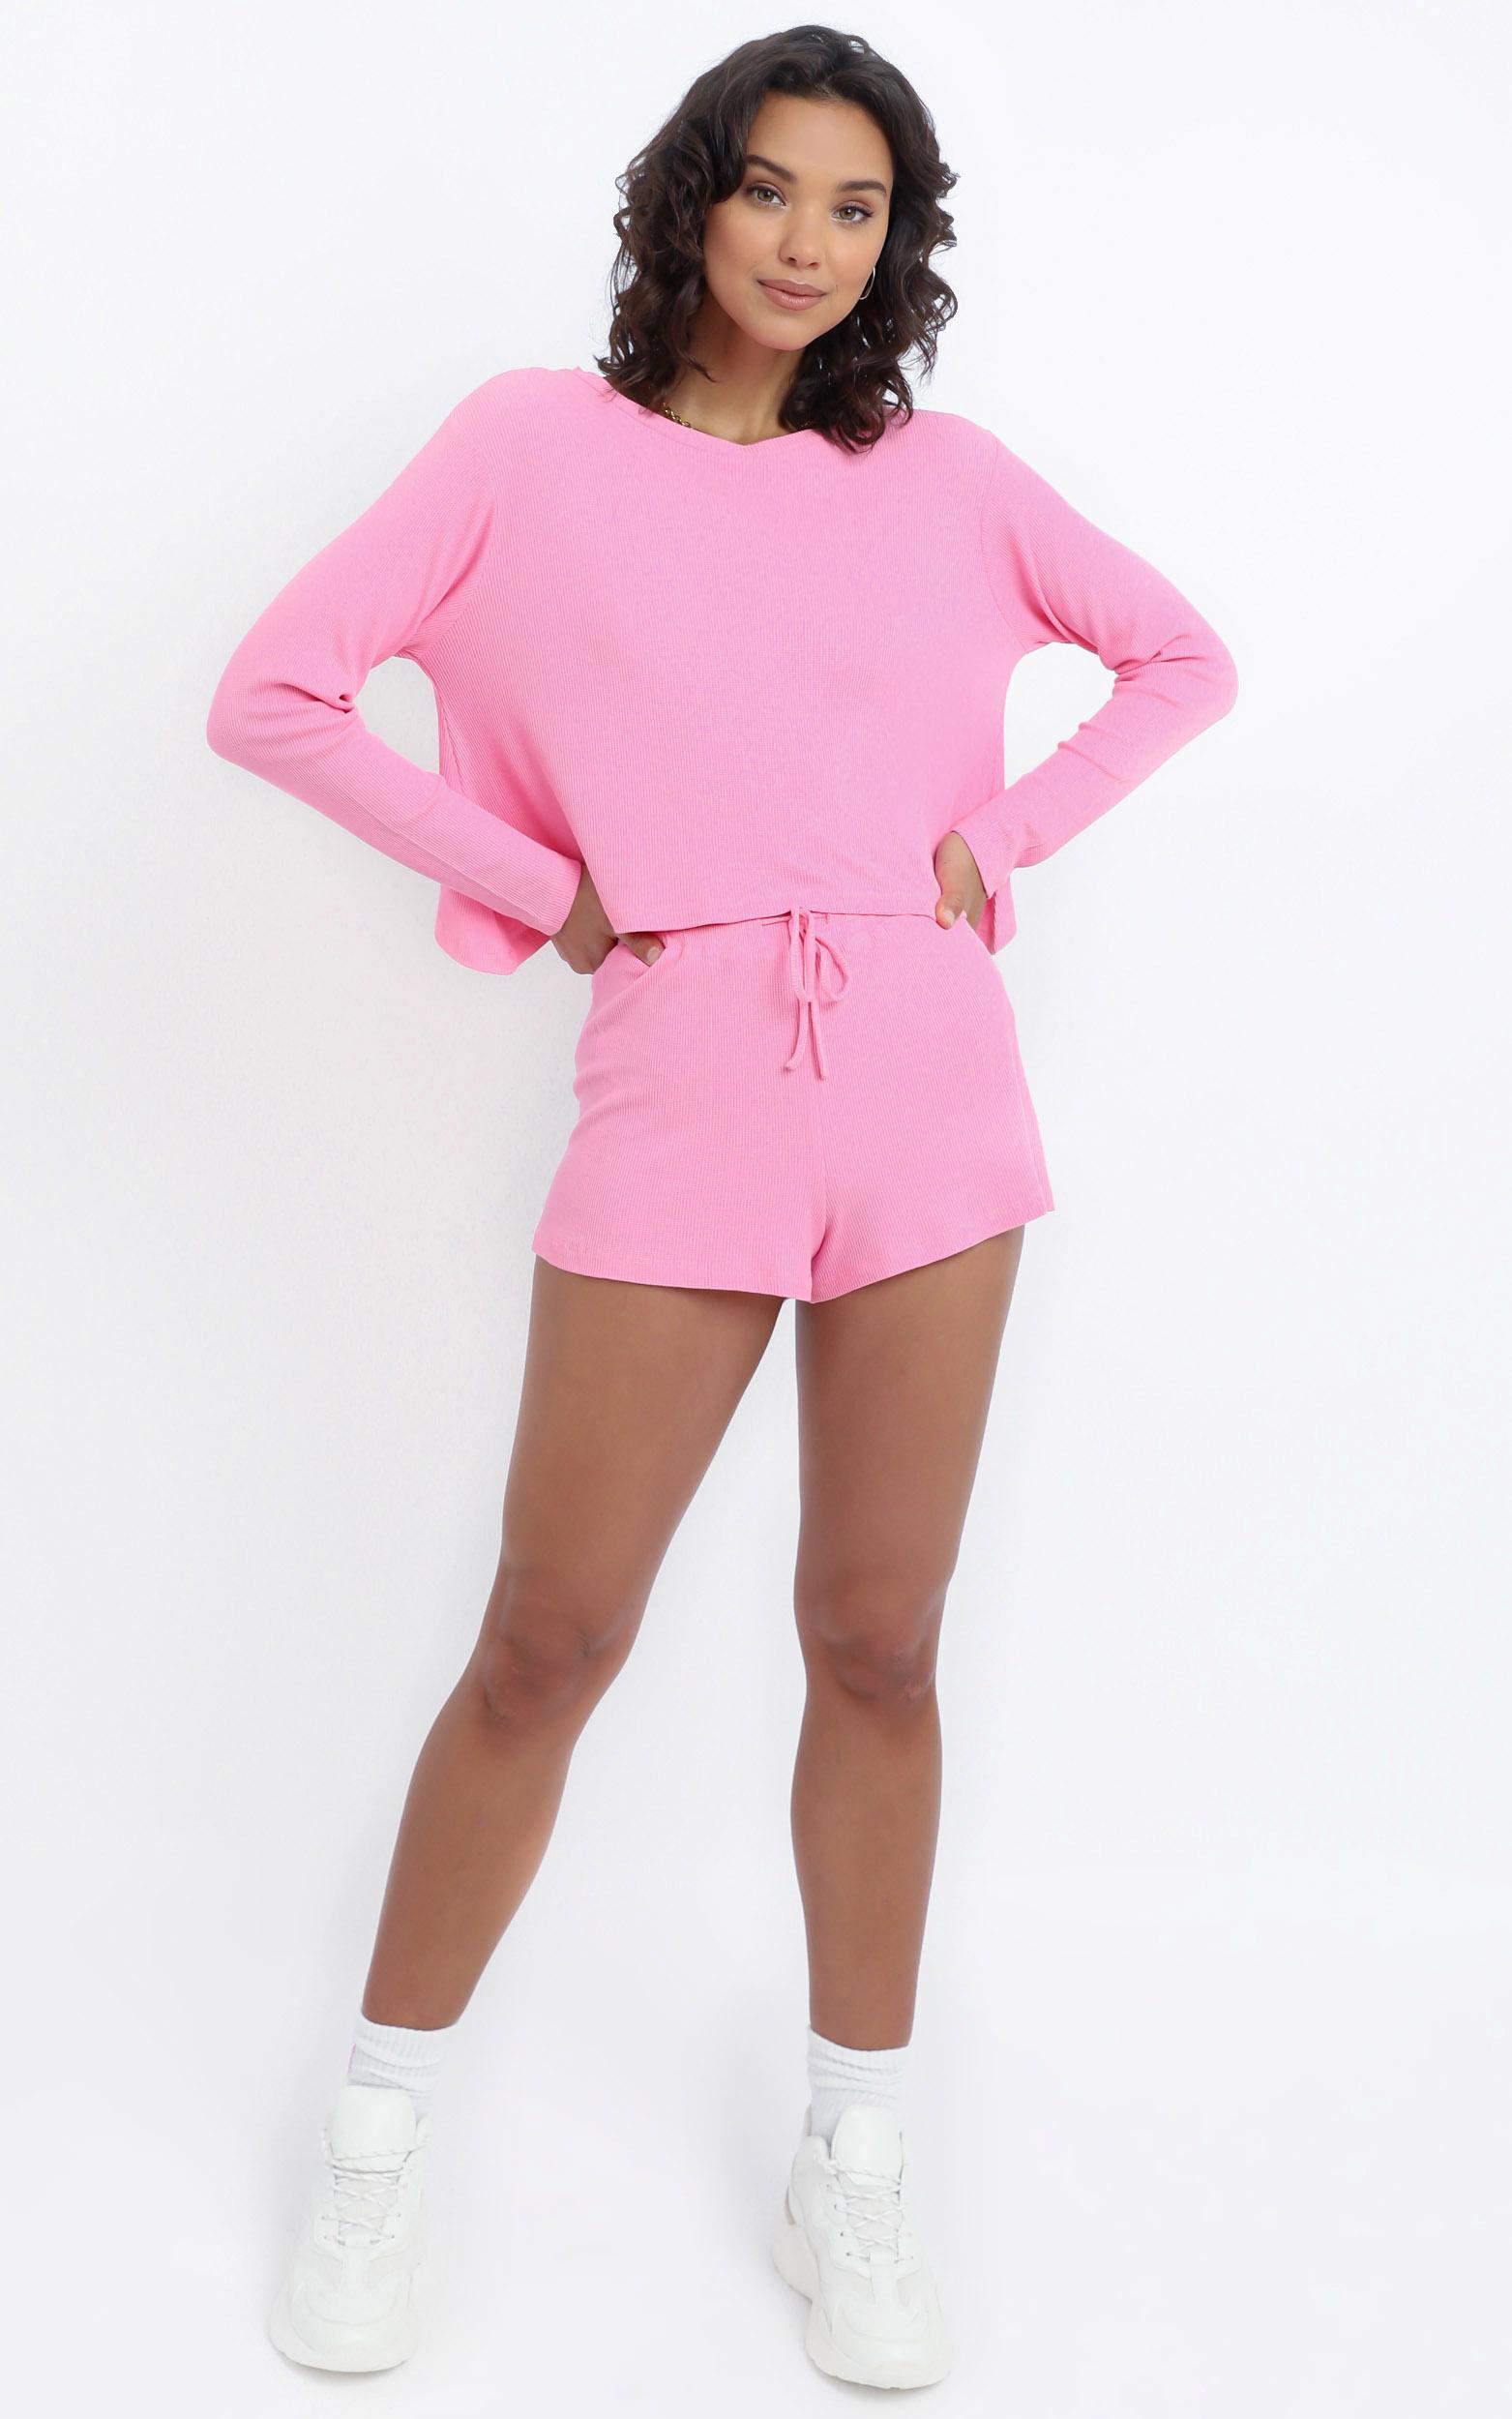 Kallan Shorts in Pink - 12 (L), PNK1, hi-res image number null